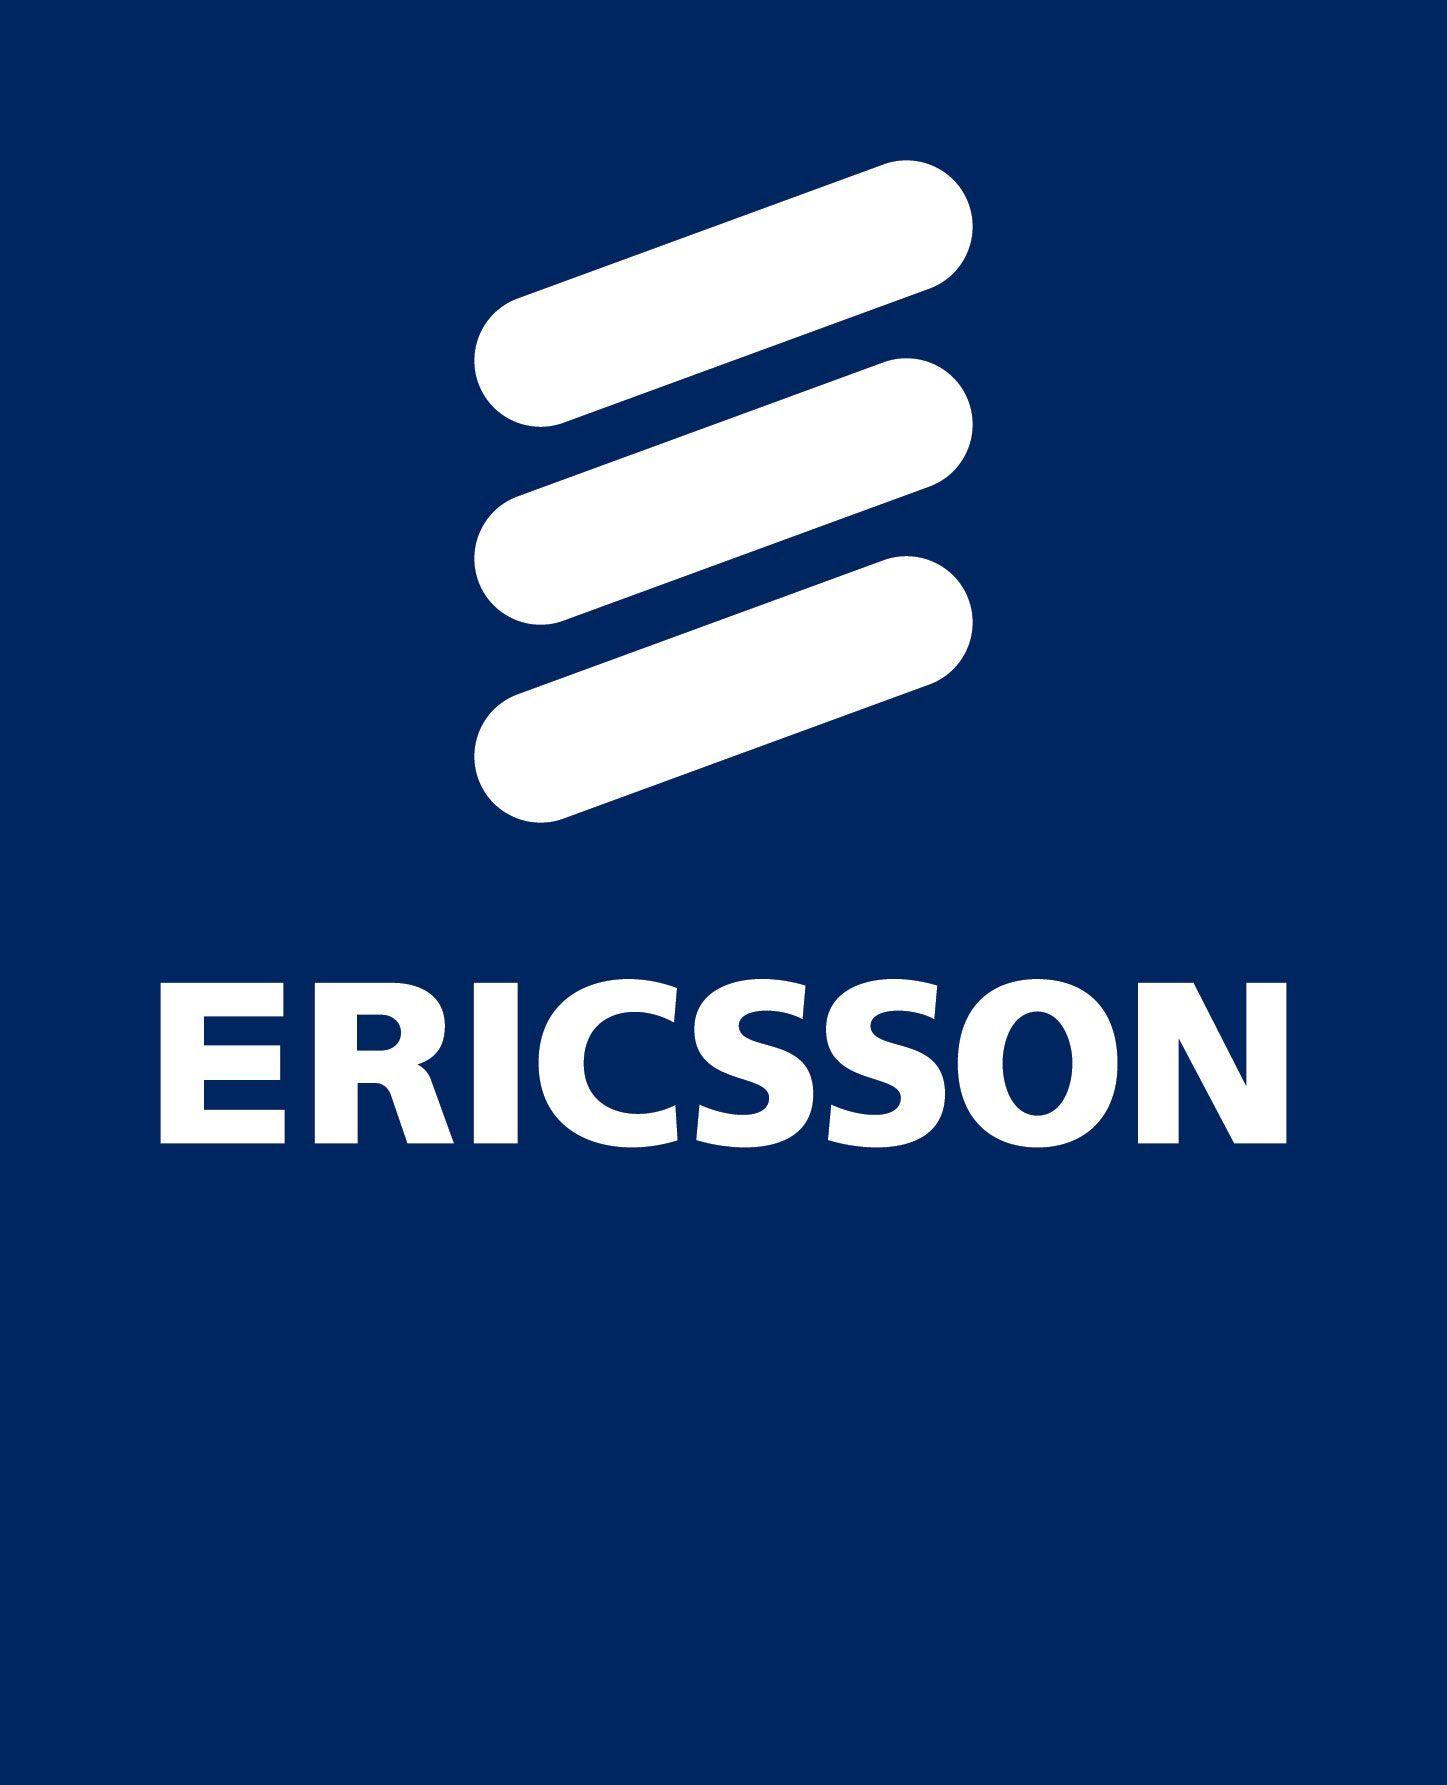 Tower One Wireless Retains Former Ericsson Telecom Senior